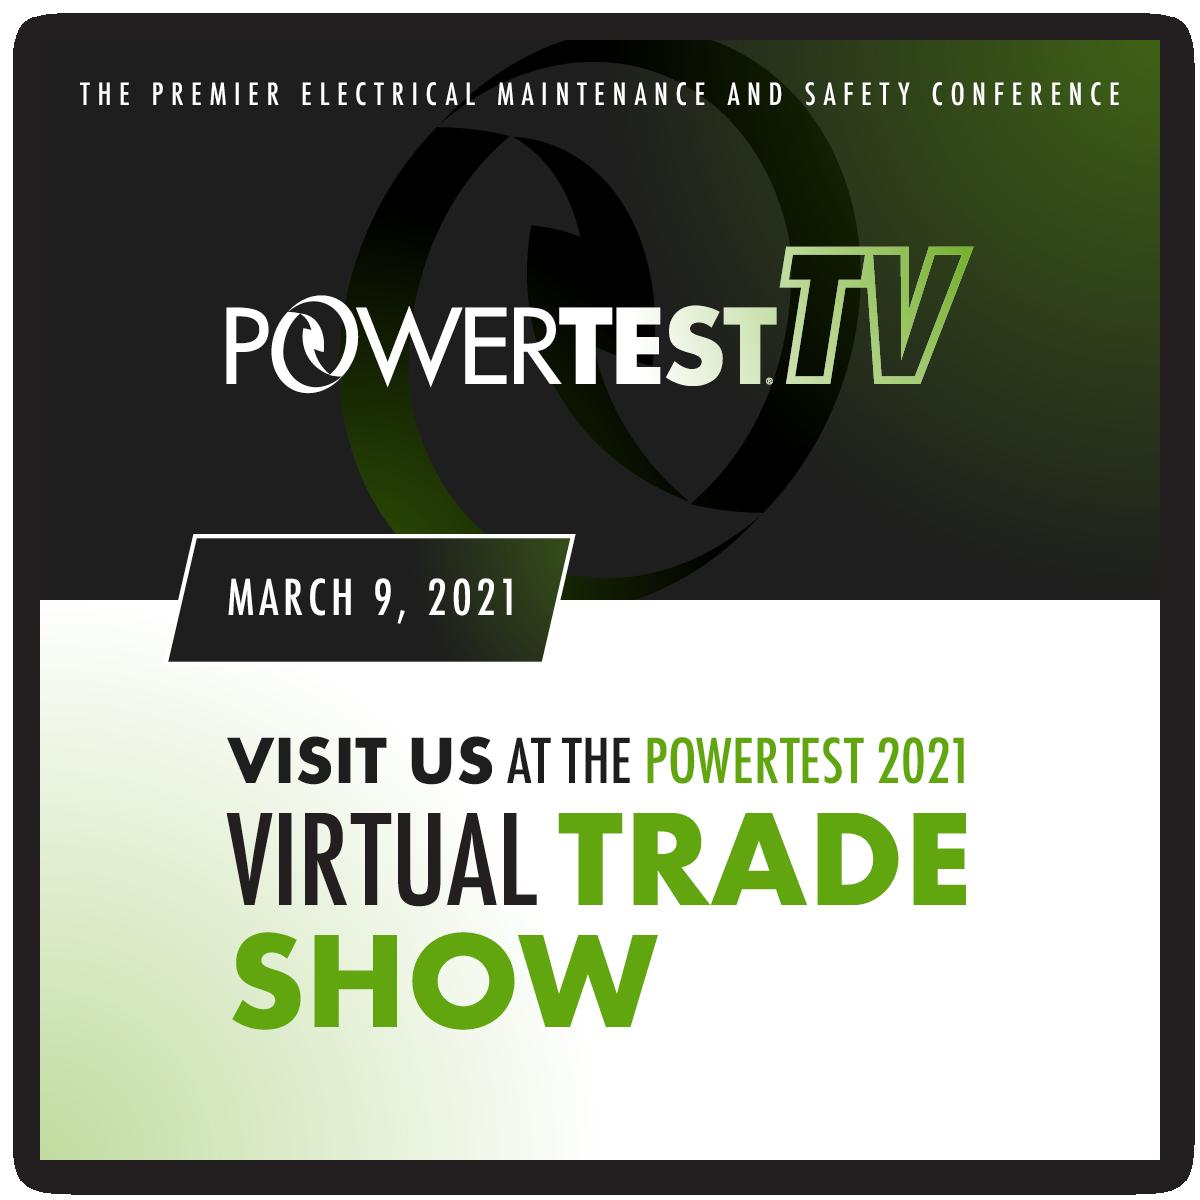 NETA PowerTest Conference & Exposition